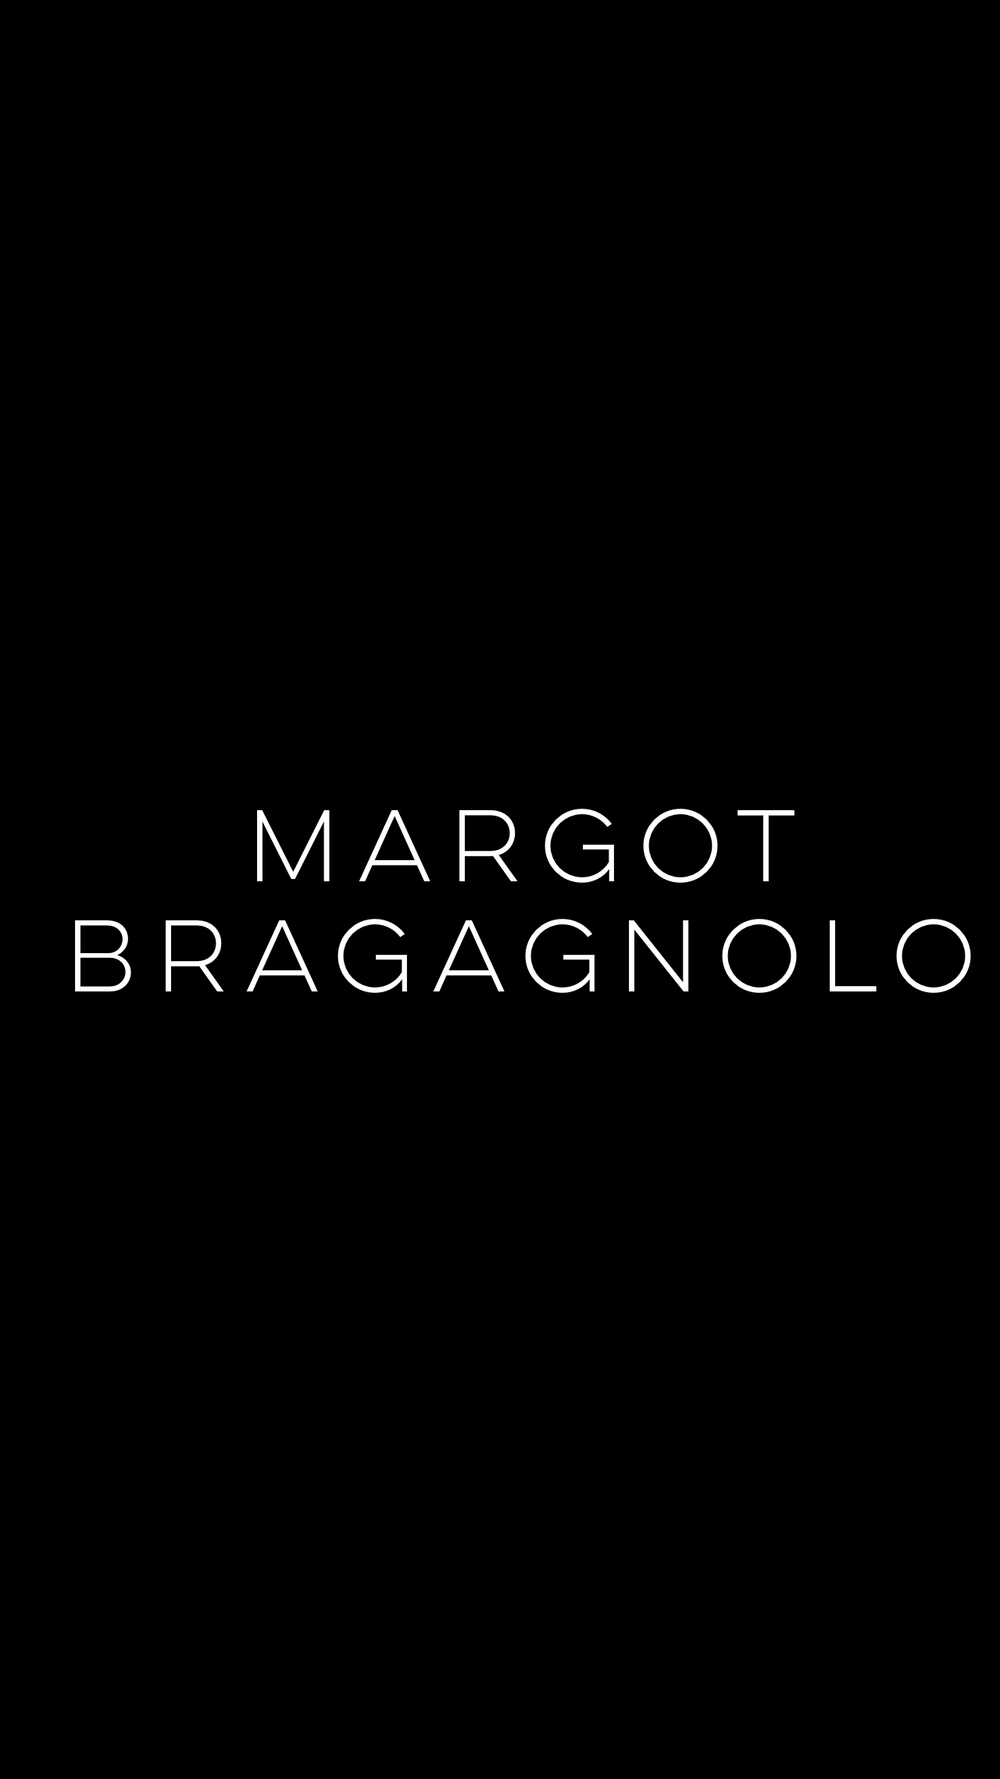 MARGOT BRAGAGNOLO.jpg